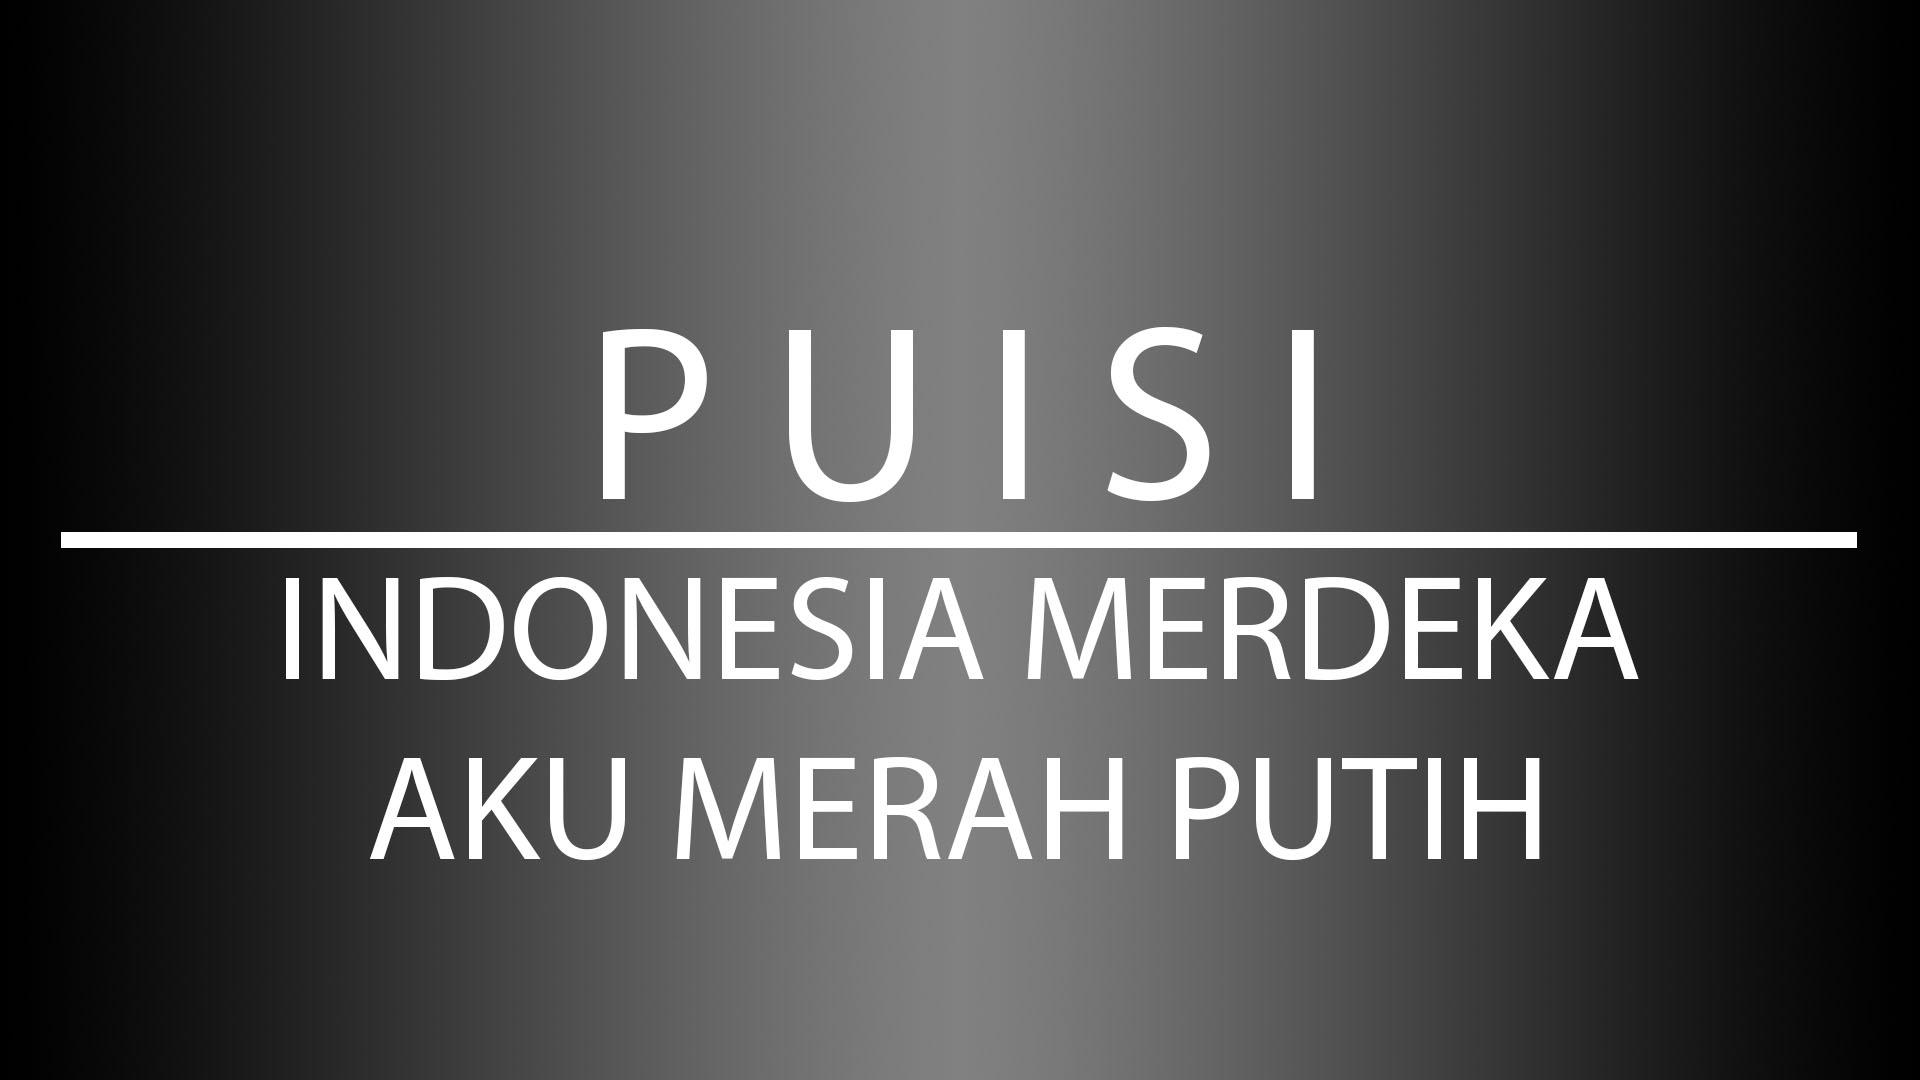 Kumpulan Puisi Indonesia Merdeka Aku Merah Putih